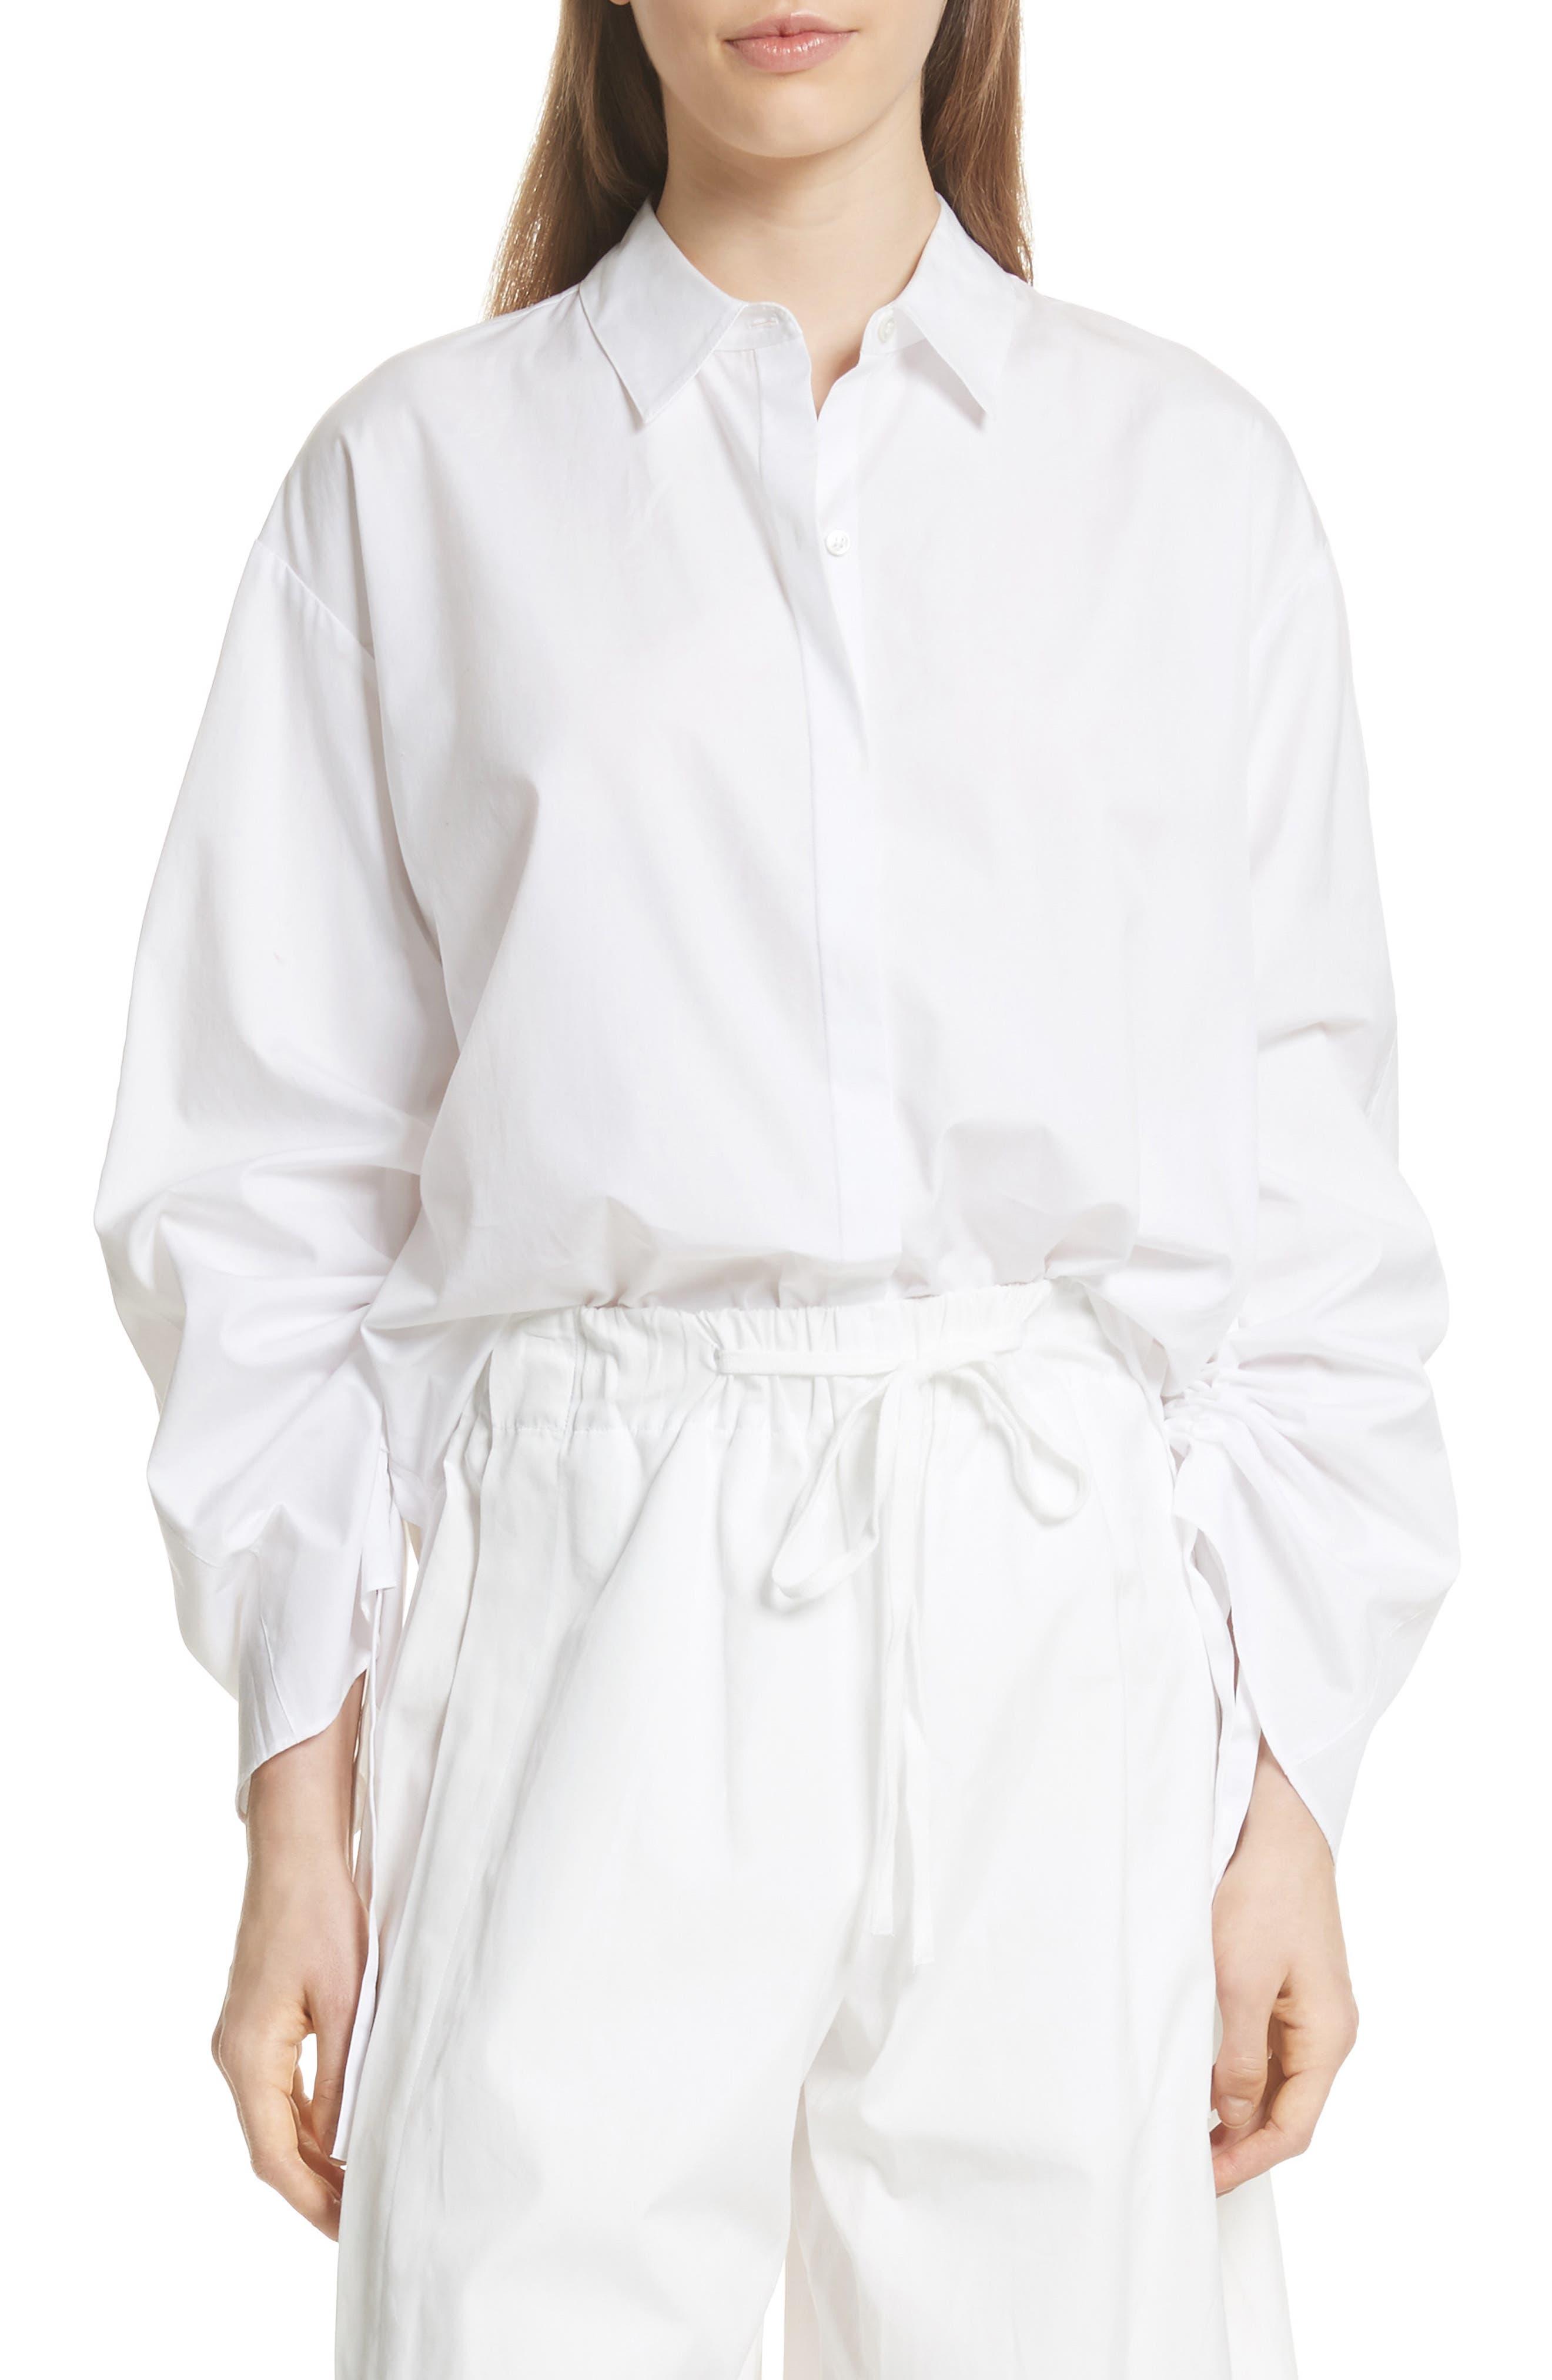 Cinch Sleeve Top,                             Main thumbnail 1, color,                             Optic White